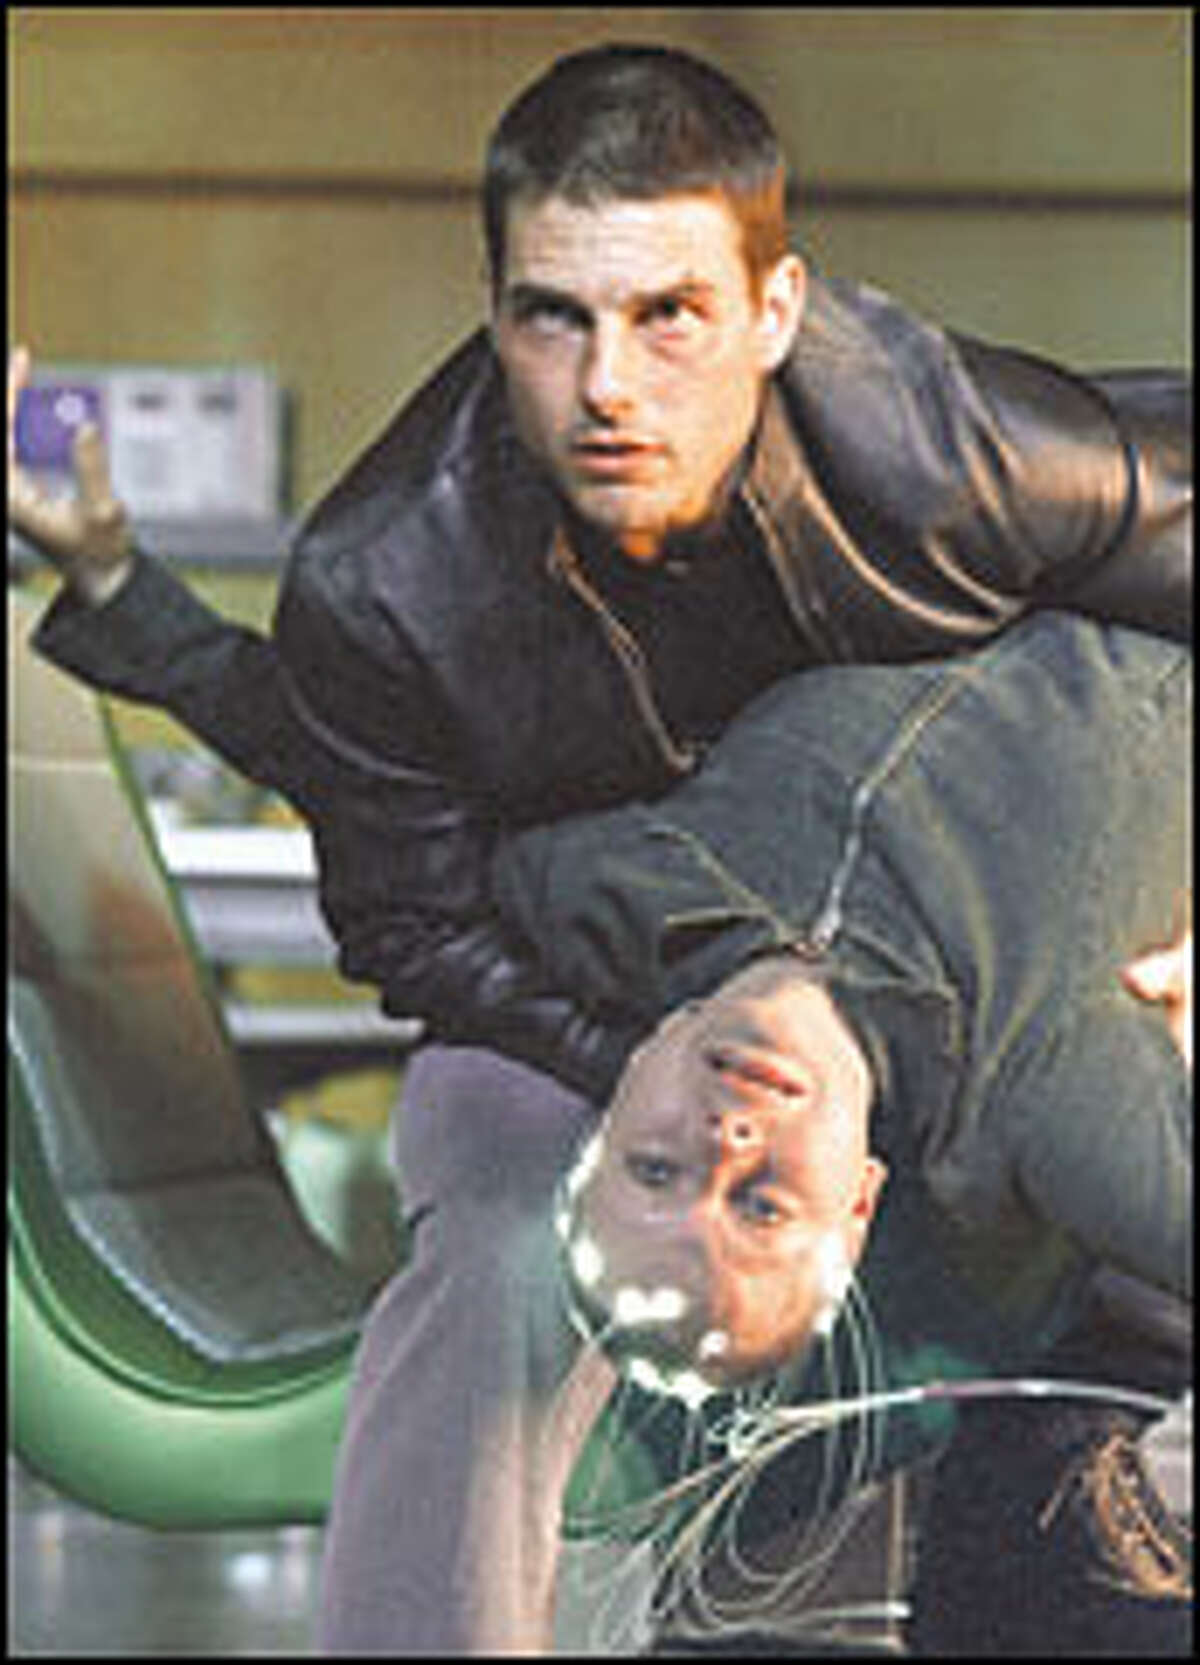 Tom Cruise and Samantha Morton in the futuristic thriller